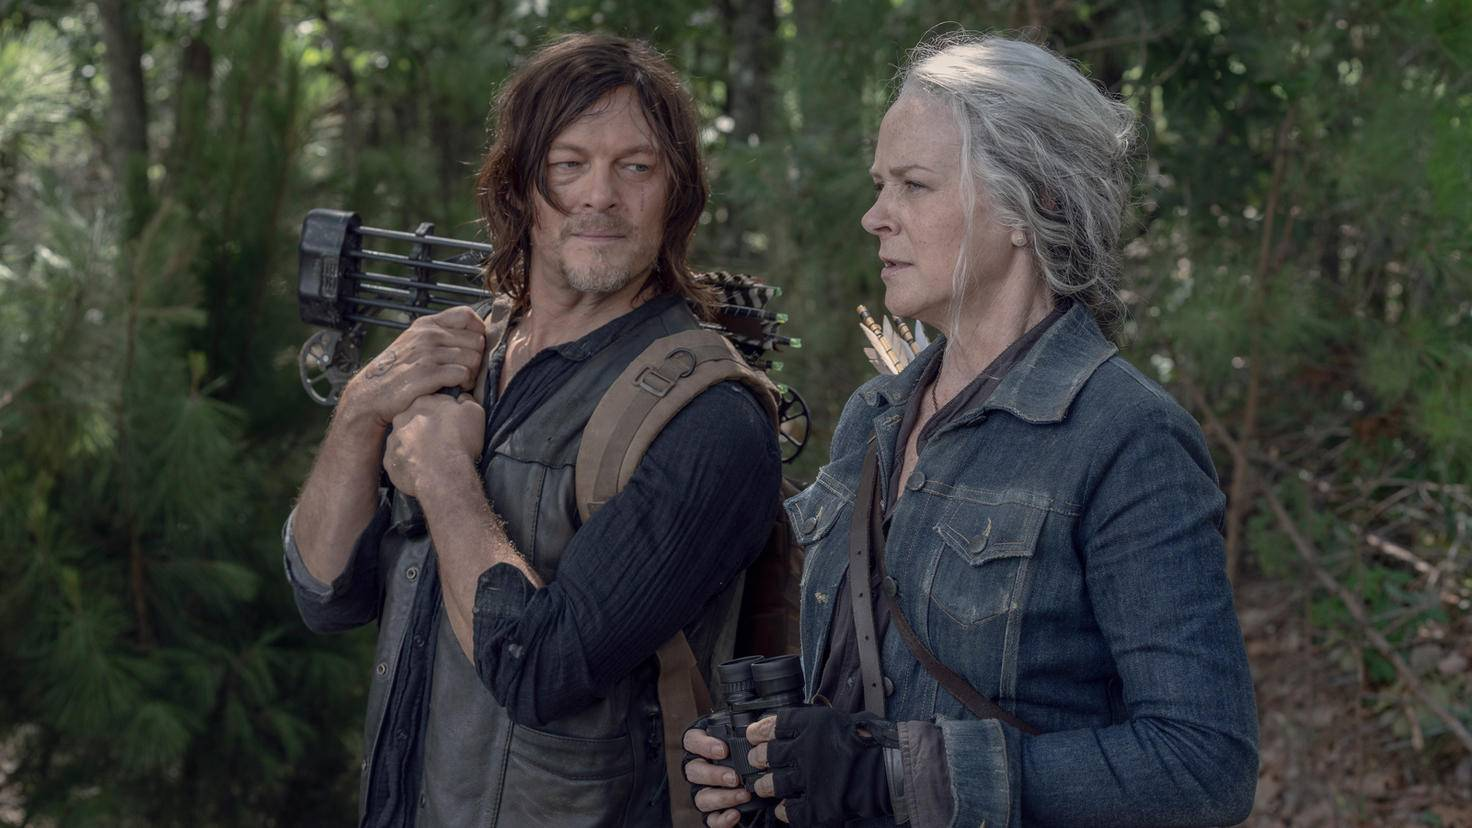 The Walking Dead-S10E06-Carol-Daryl-Jace Downs-AMC